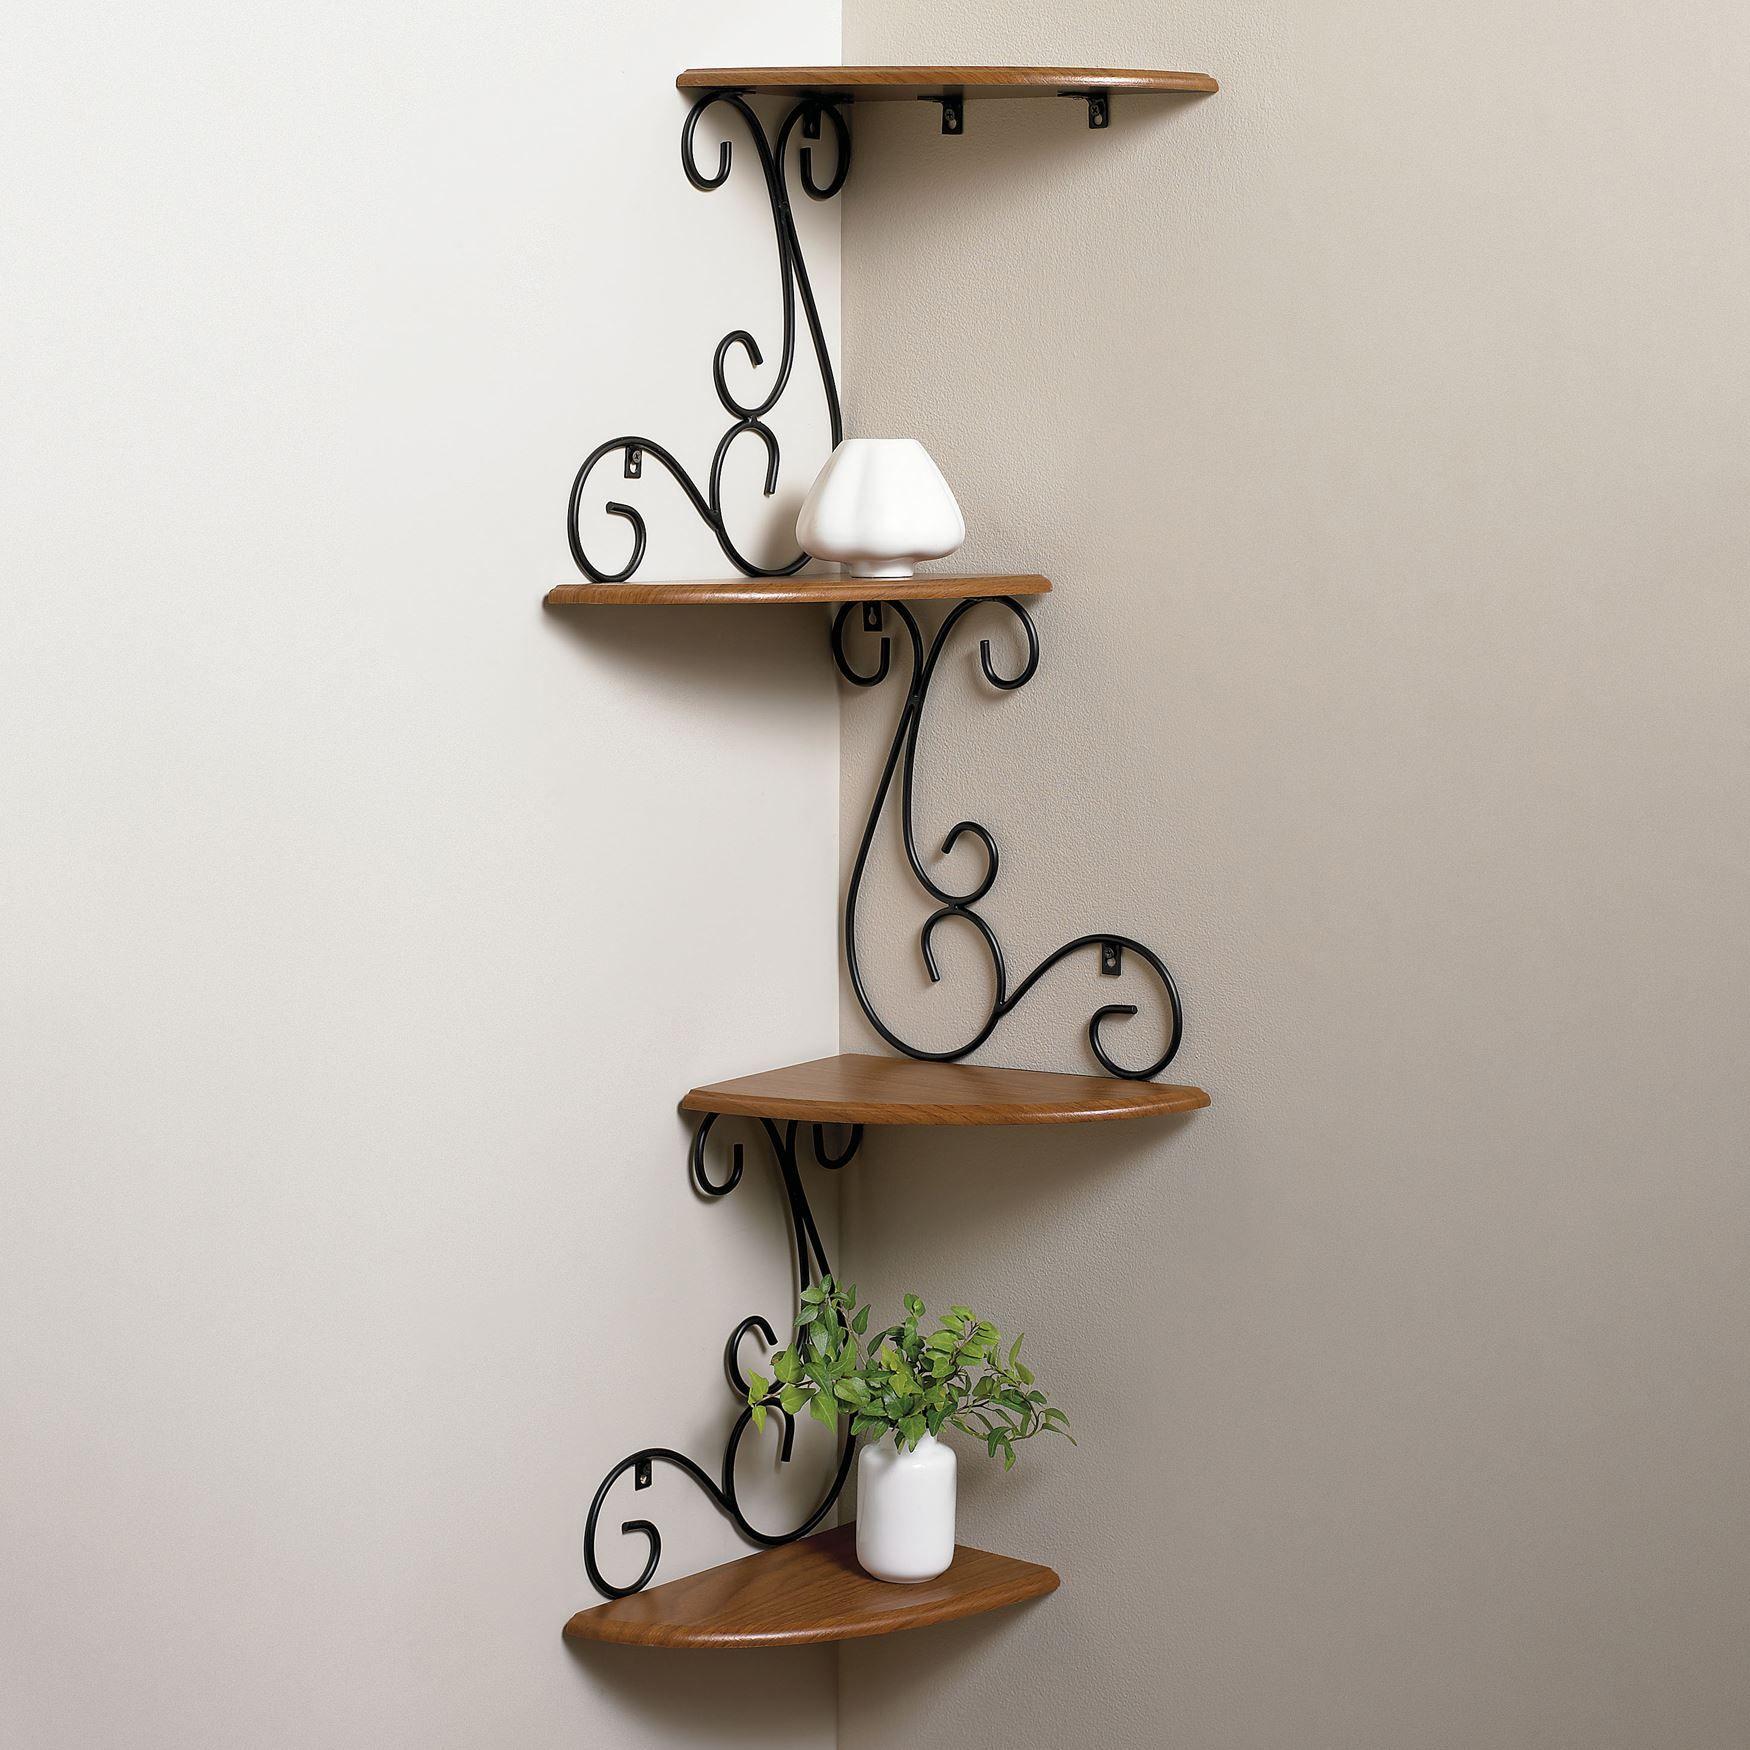 Home Furnishings & Décor | Indoor & Outdoor Furniture